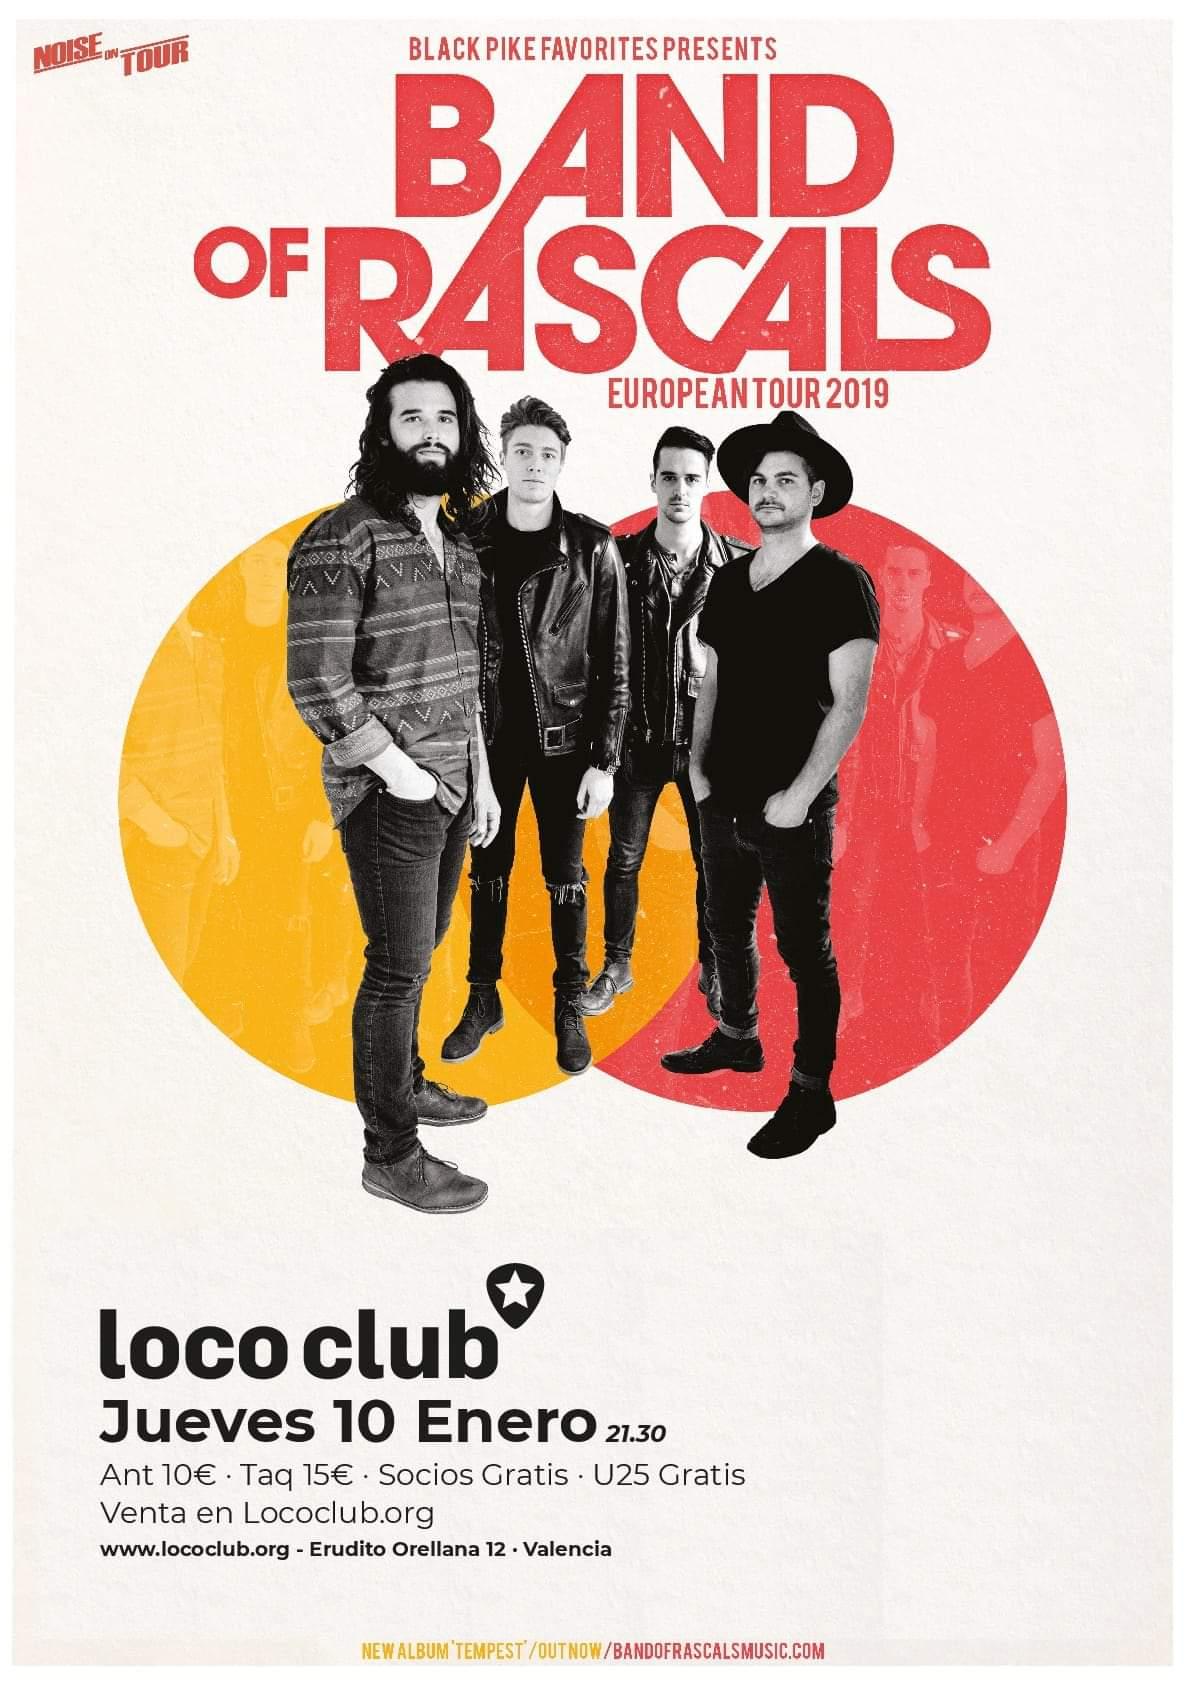 BAND OF RASCALS 10 DE ENERO 2019 LOCO CLUB  Fb_im166